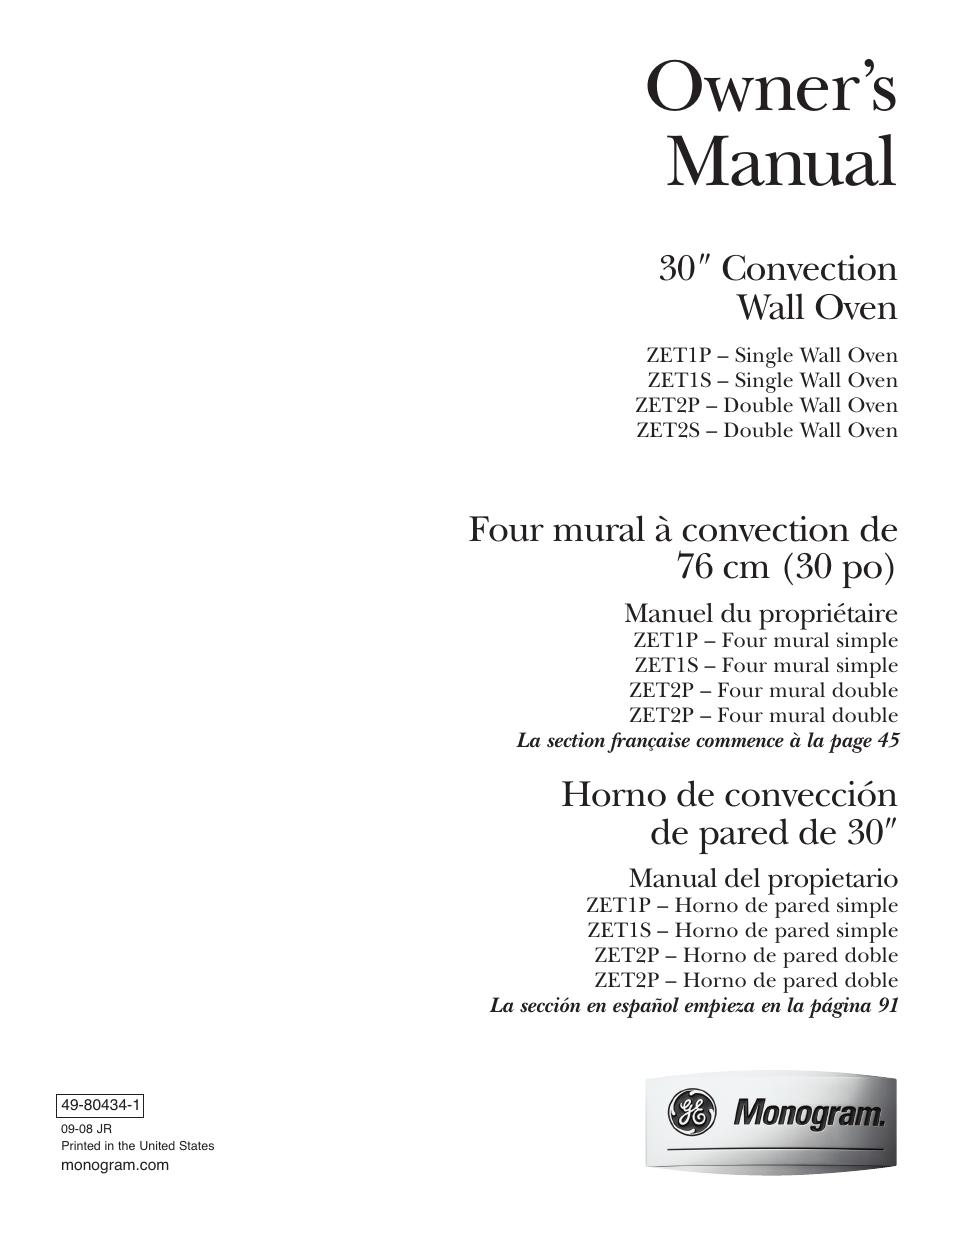 ge monogram zet2s user manual 128 pages original mode also for rh  manualsdir com ge monogram oven owner's manual GE Monogram Convection Oven  Manual